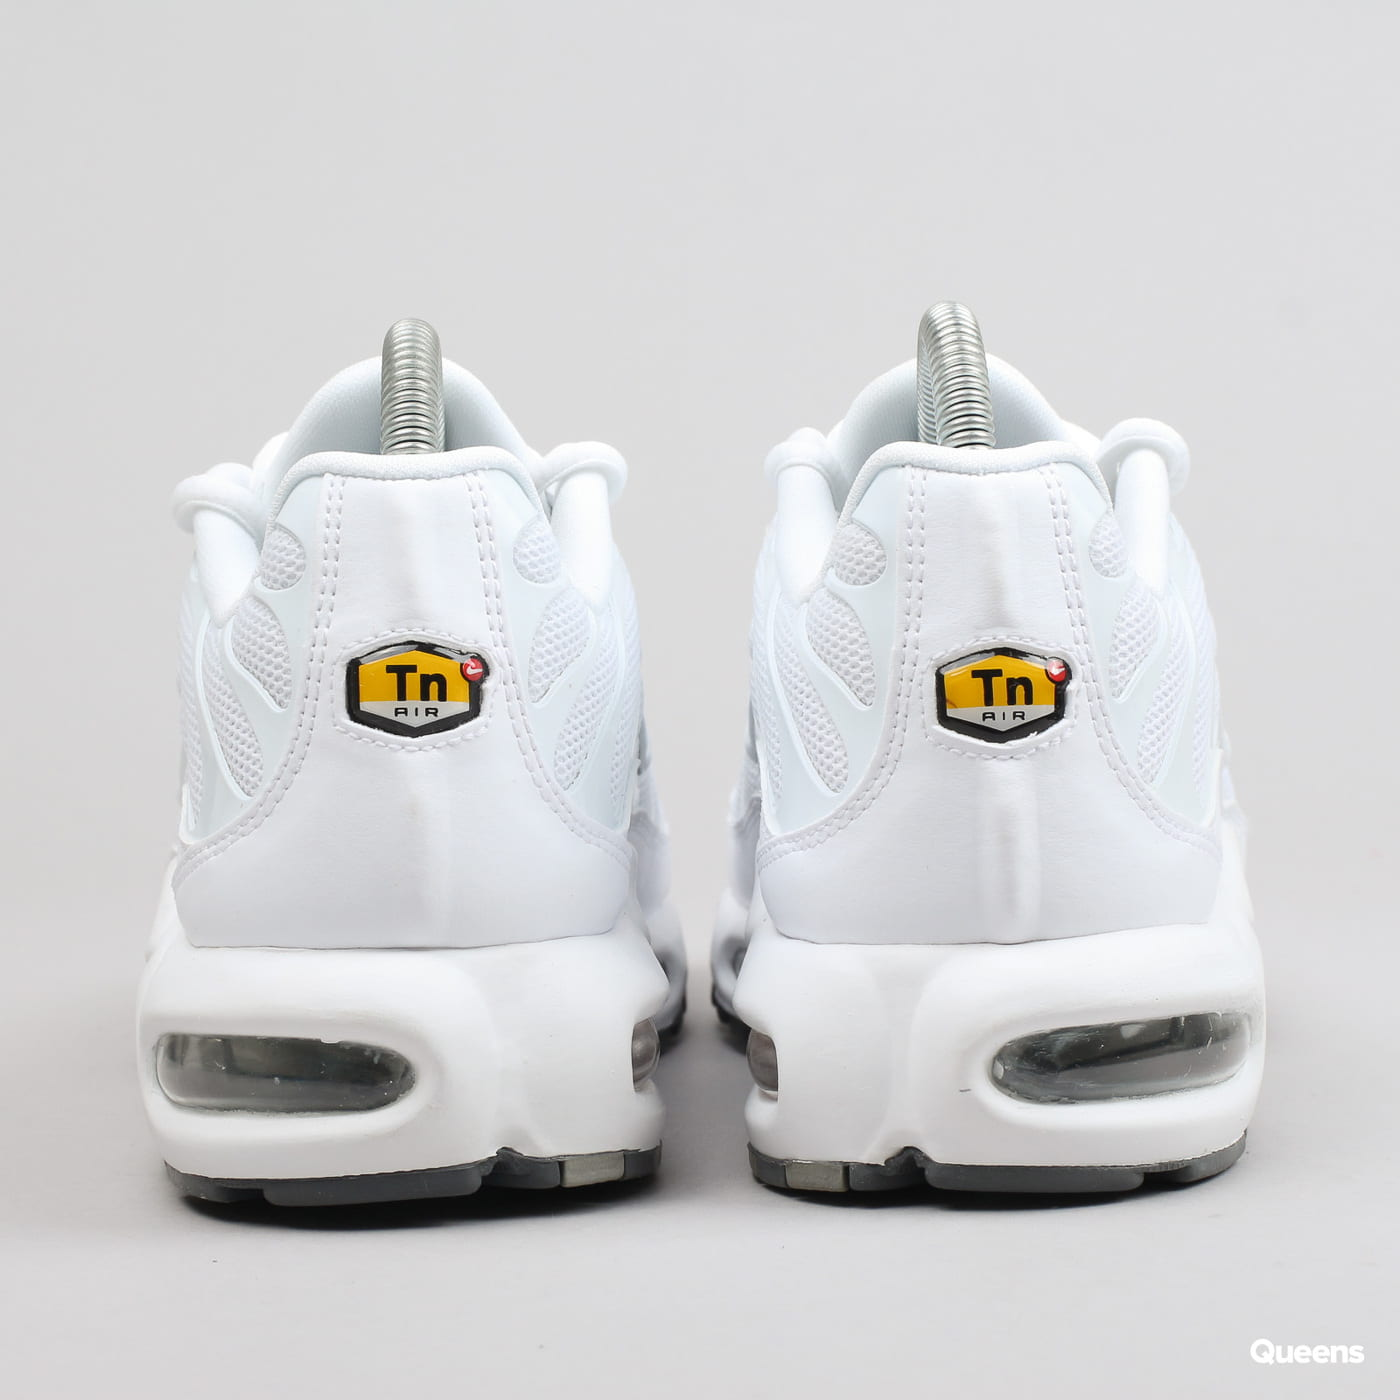 Nike Air Max Plus white / white - black - cool grey